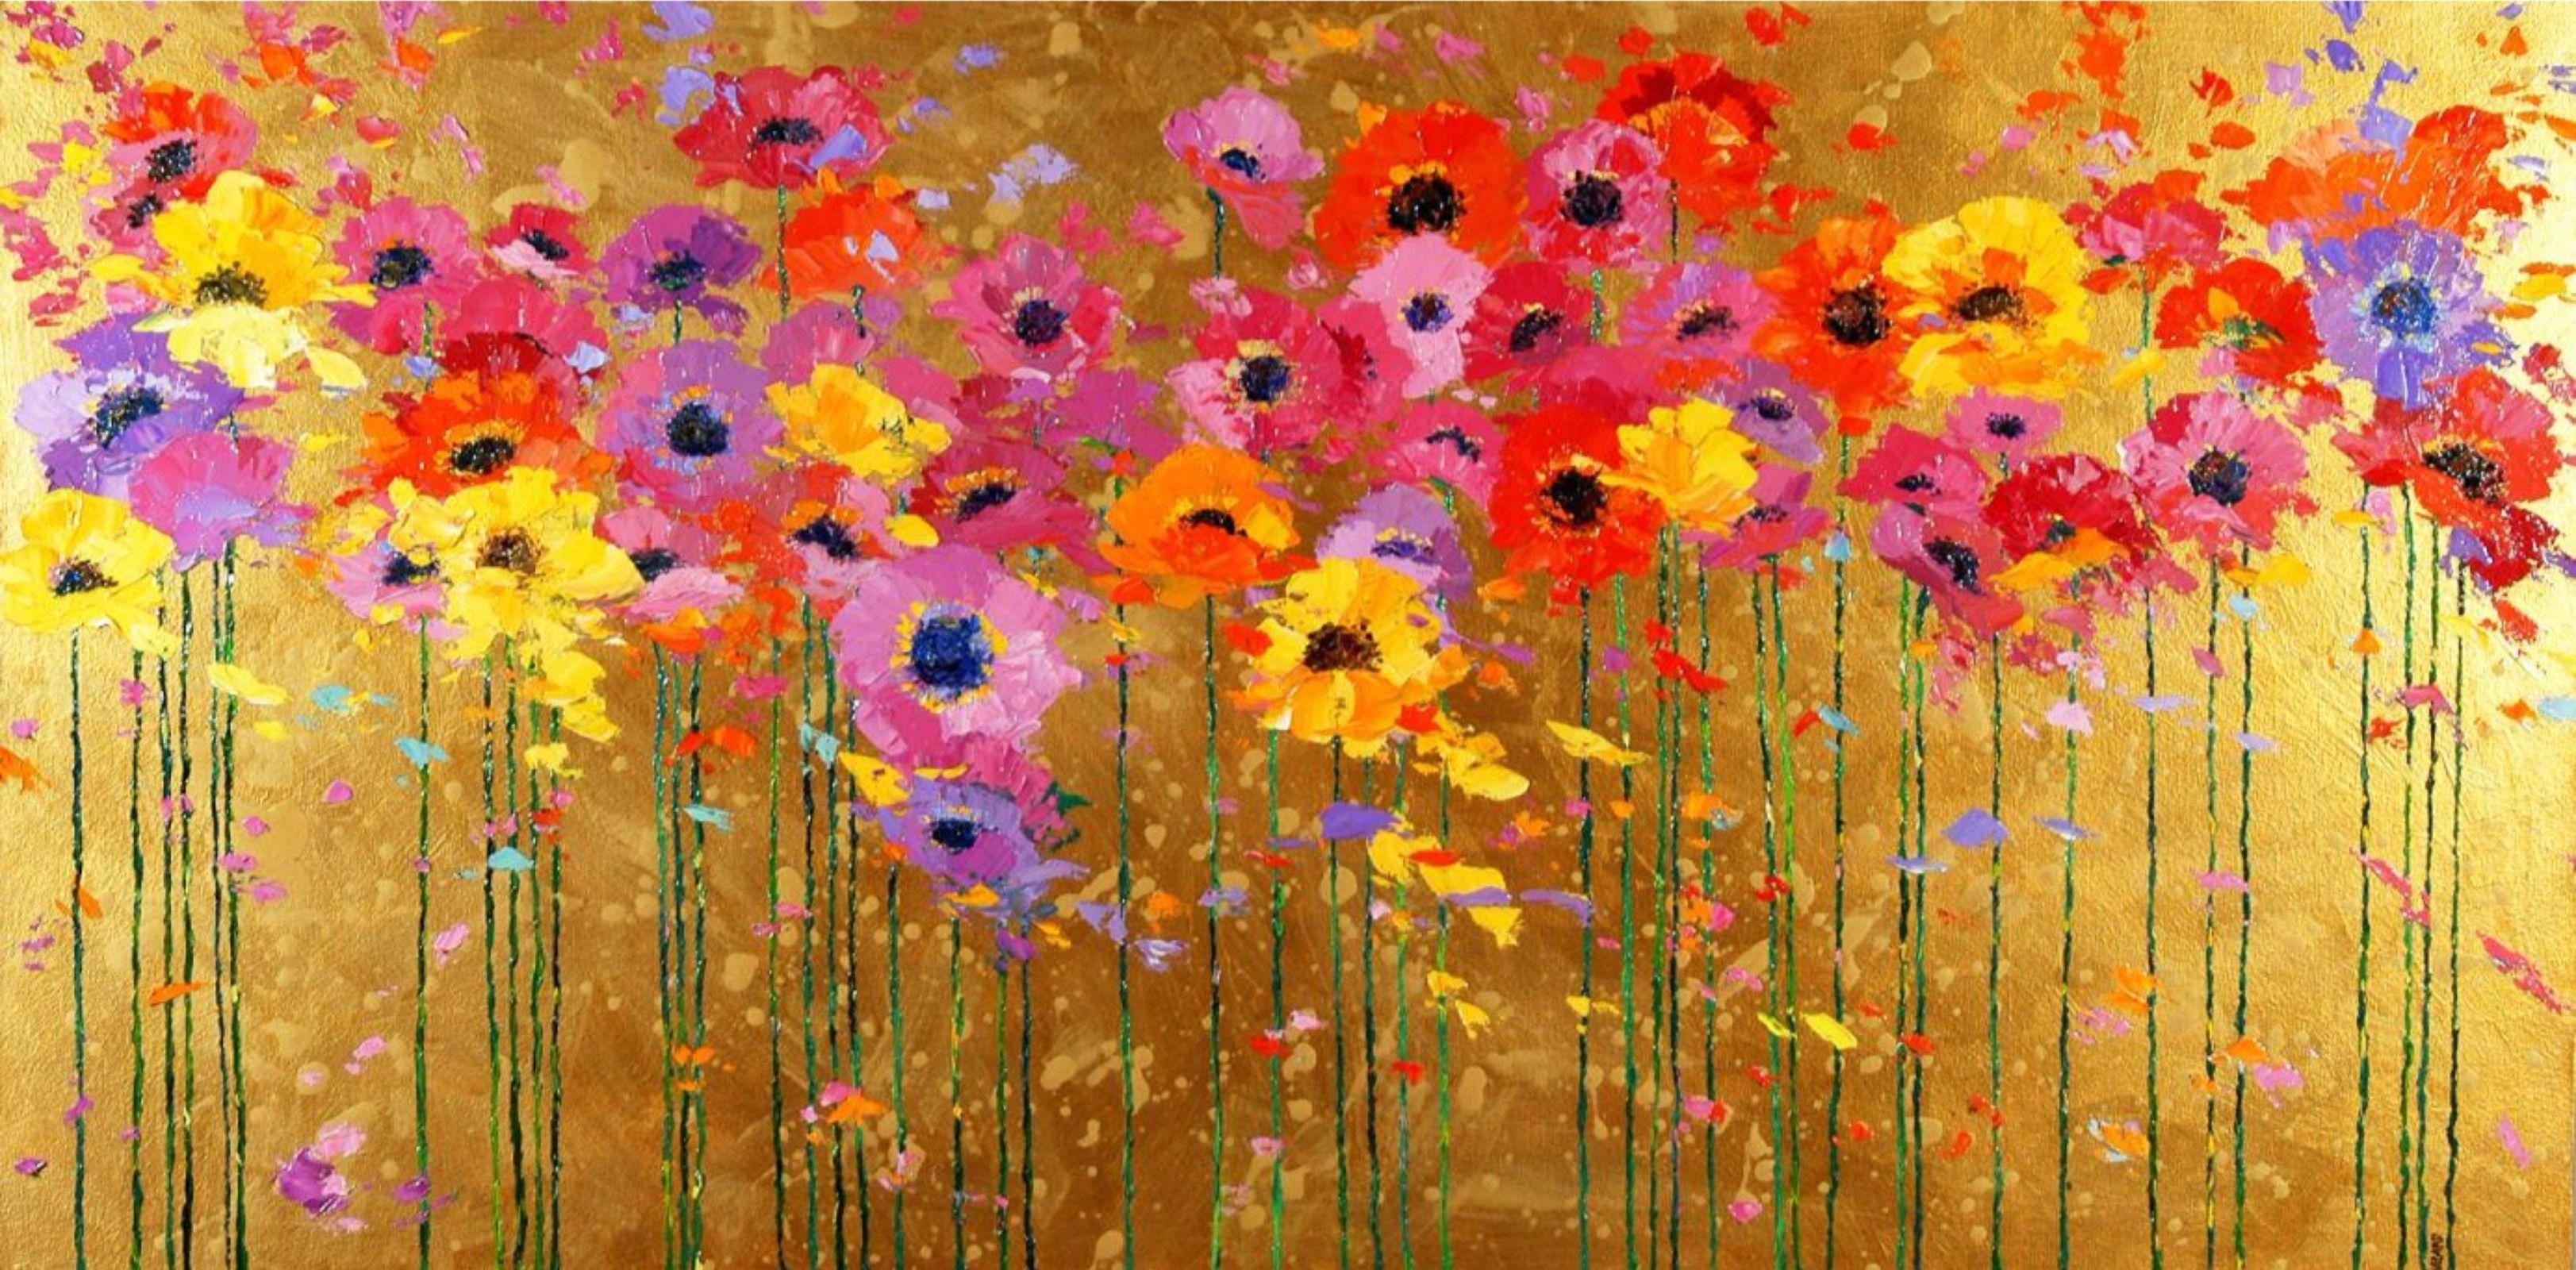 2017 03 25 Flower Background Desktop Free 1634409 Gogolmogol